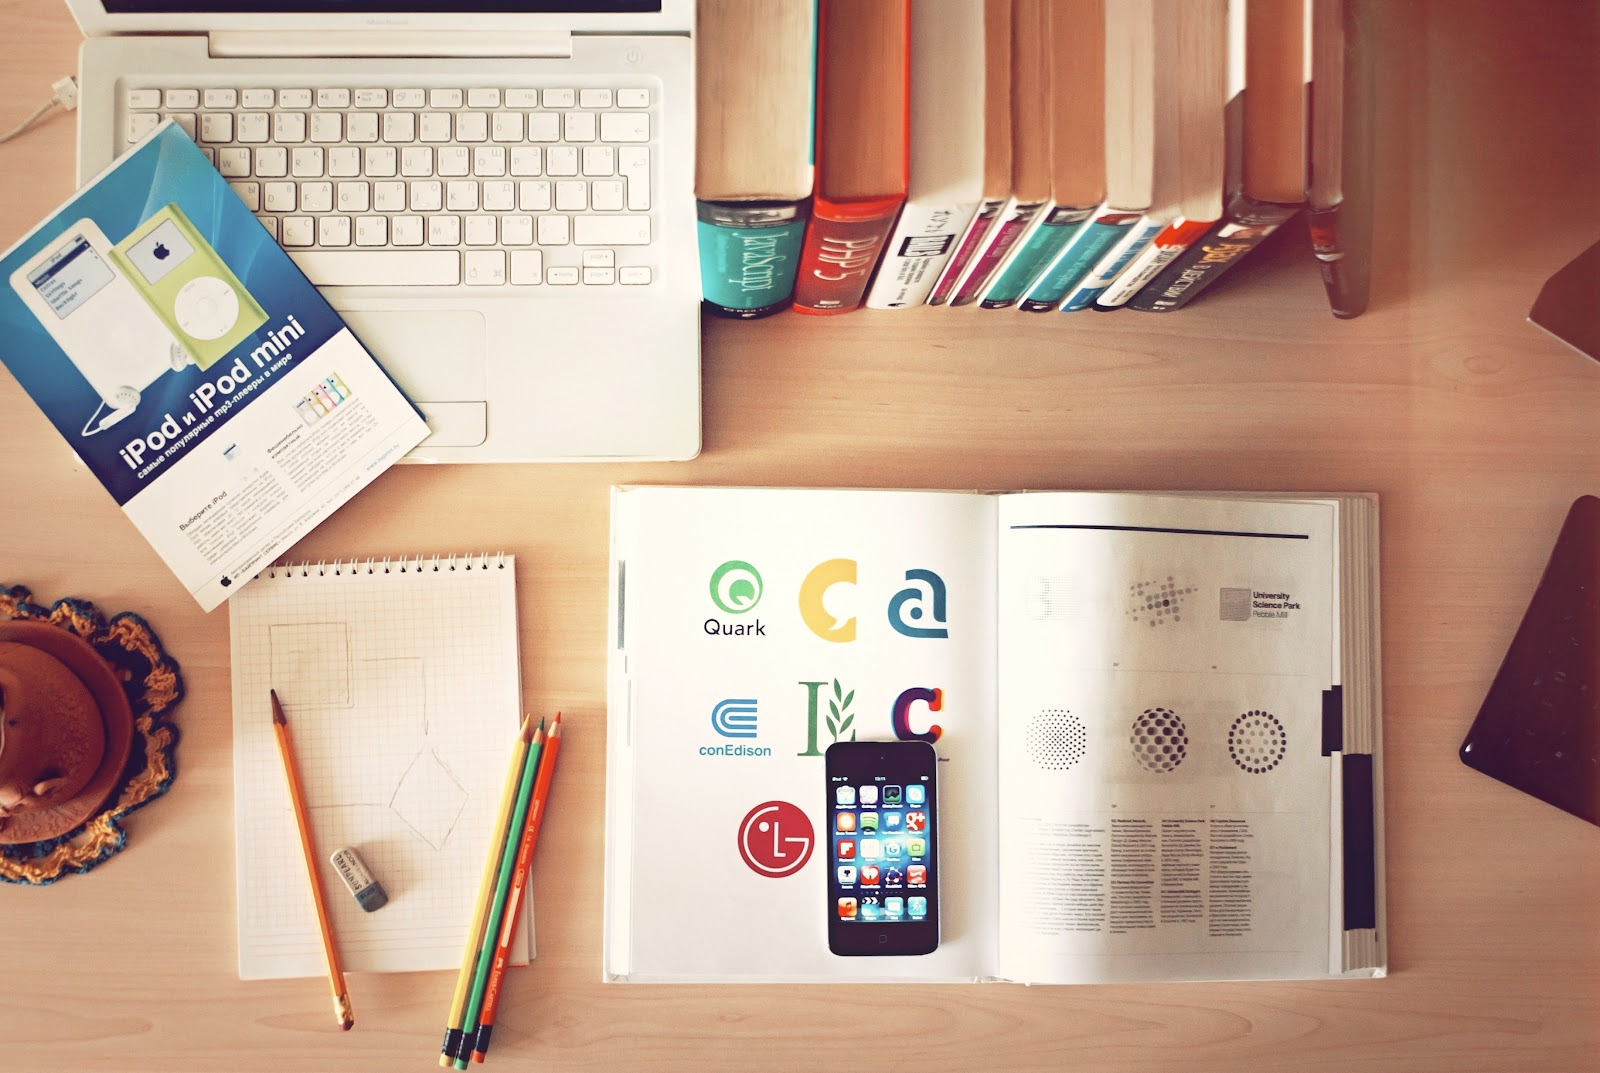 apple-iphone-books-desk.jpg